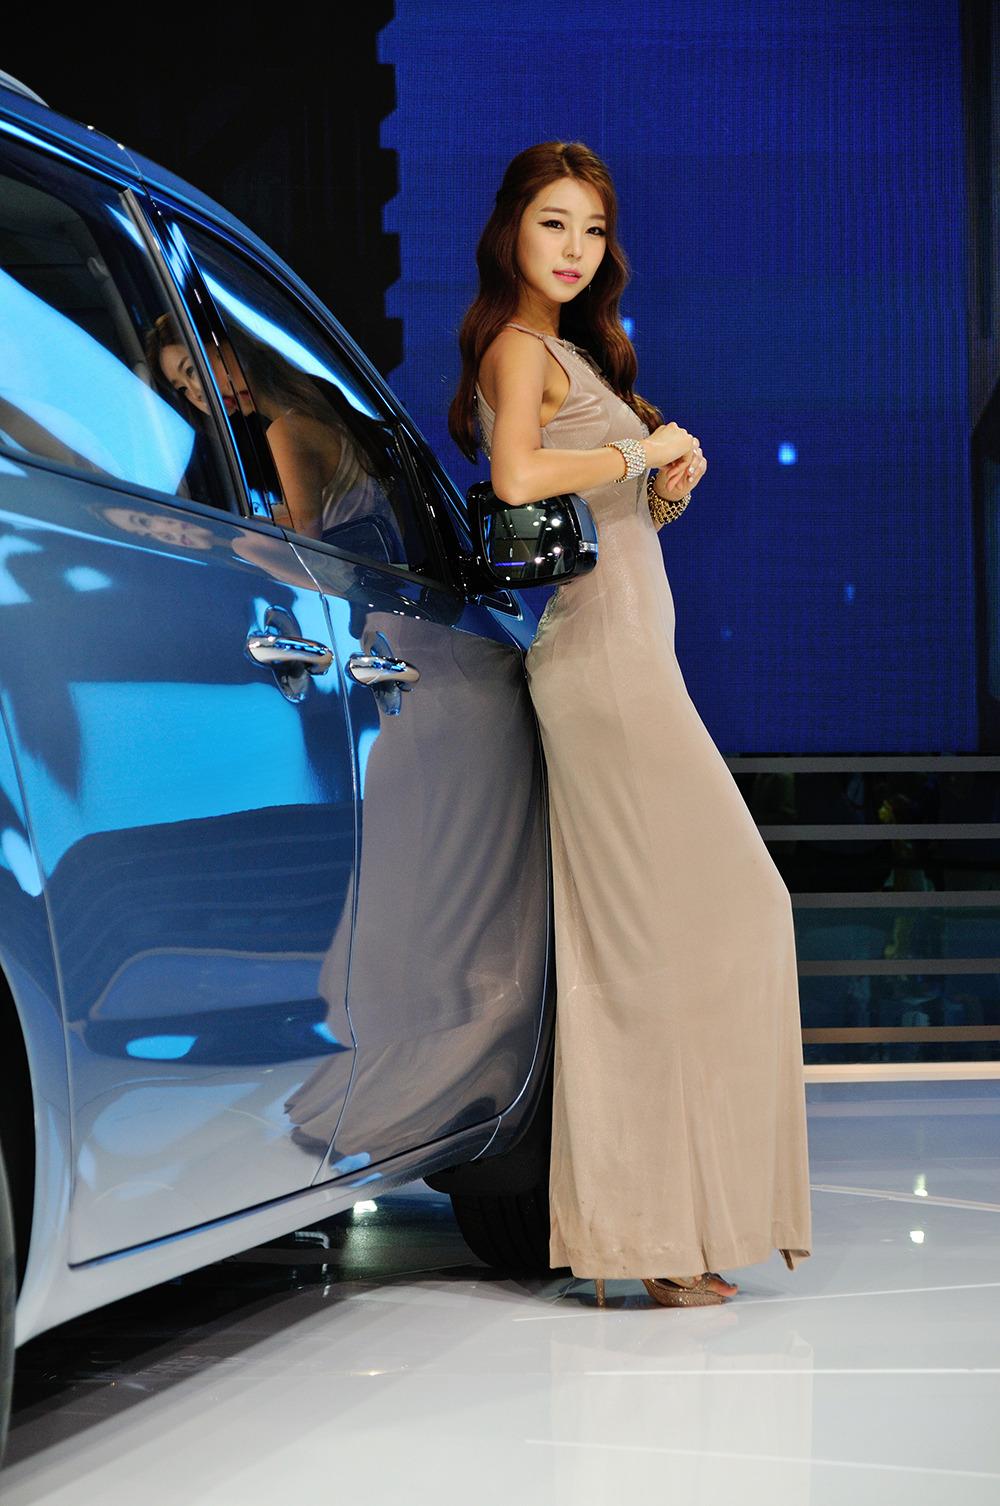 Model - 김현정